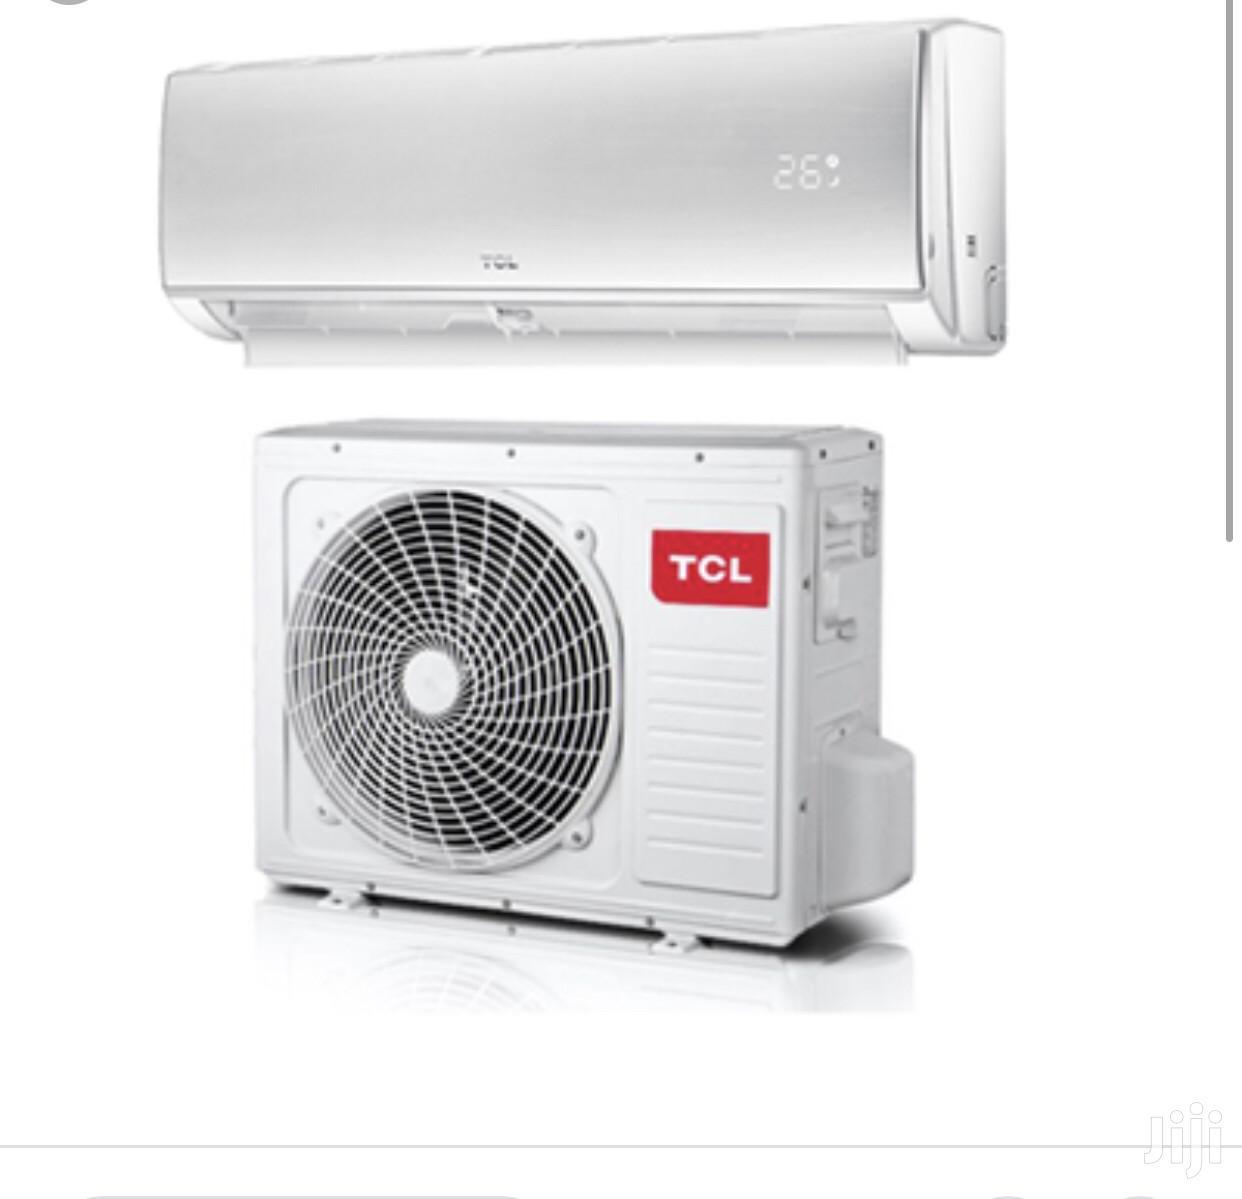 TCL 1.5 HP Split A/C ) 3 Stars Fast Cooling Gas R410